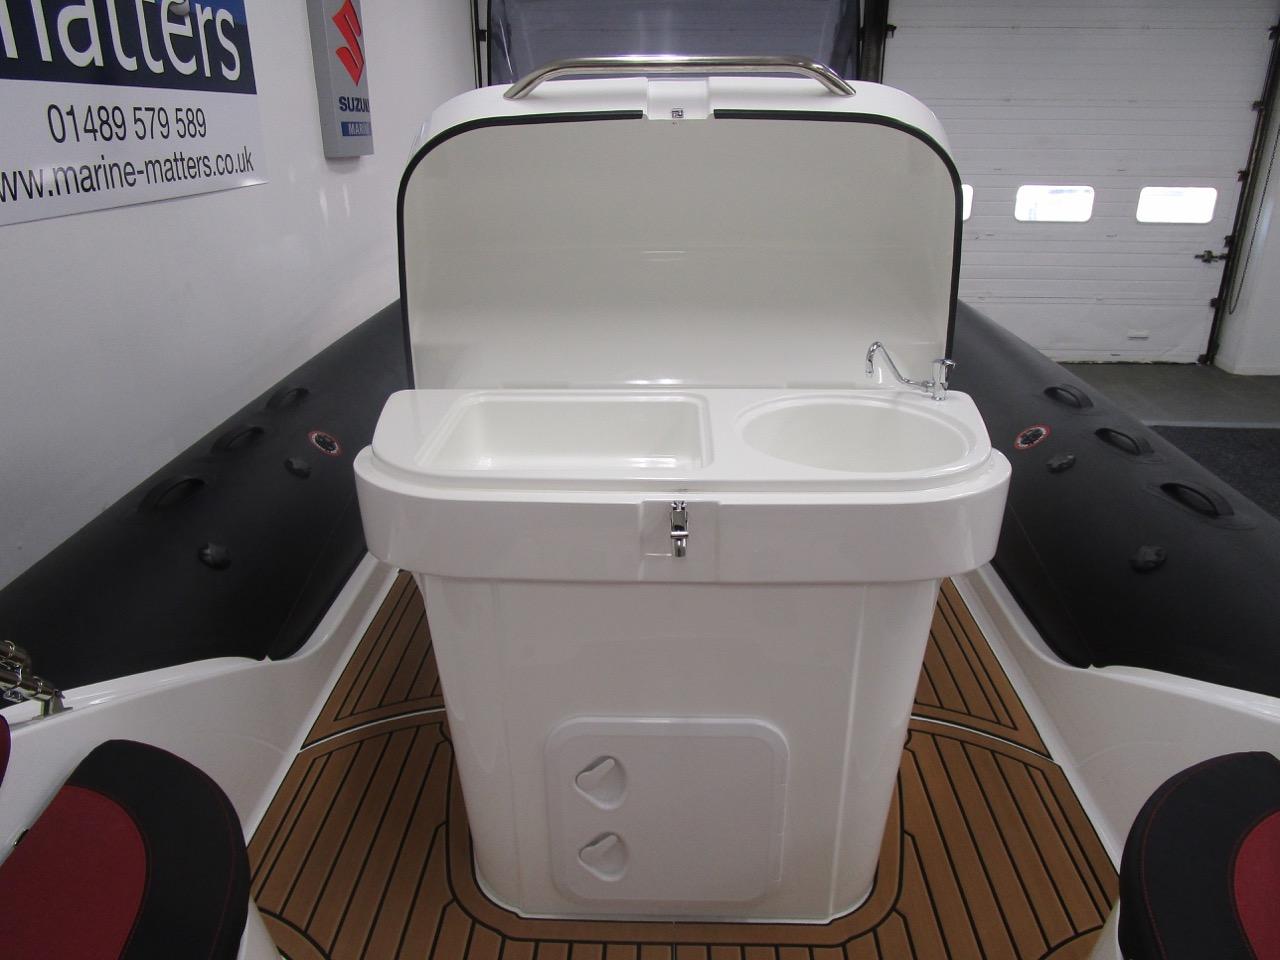 GRAND G850 RIB helm seat sink top open